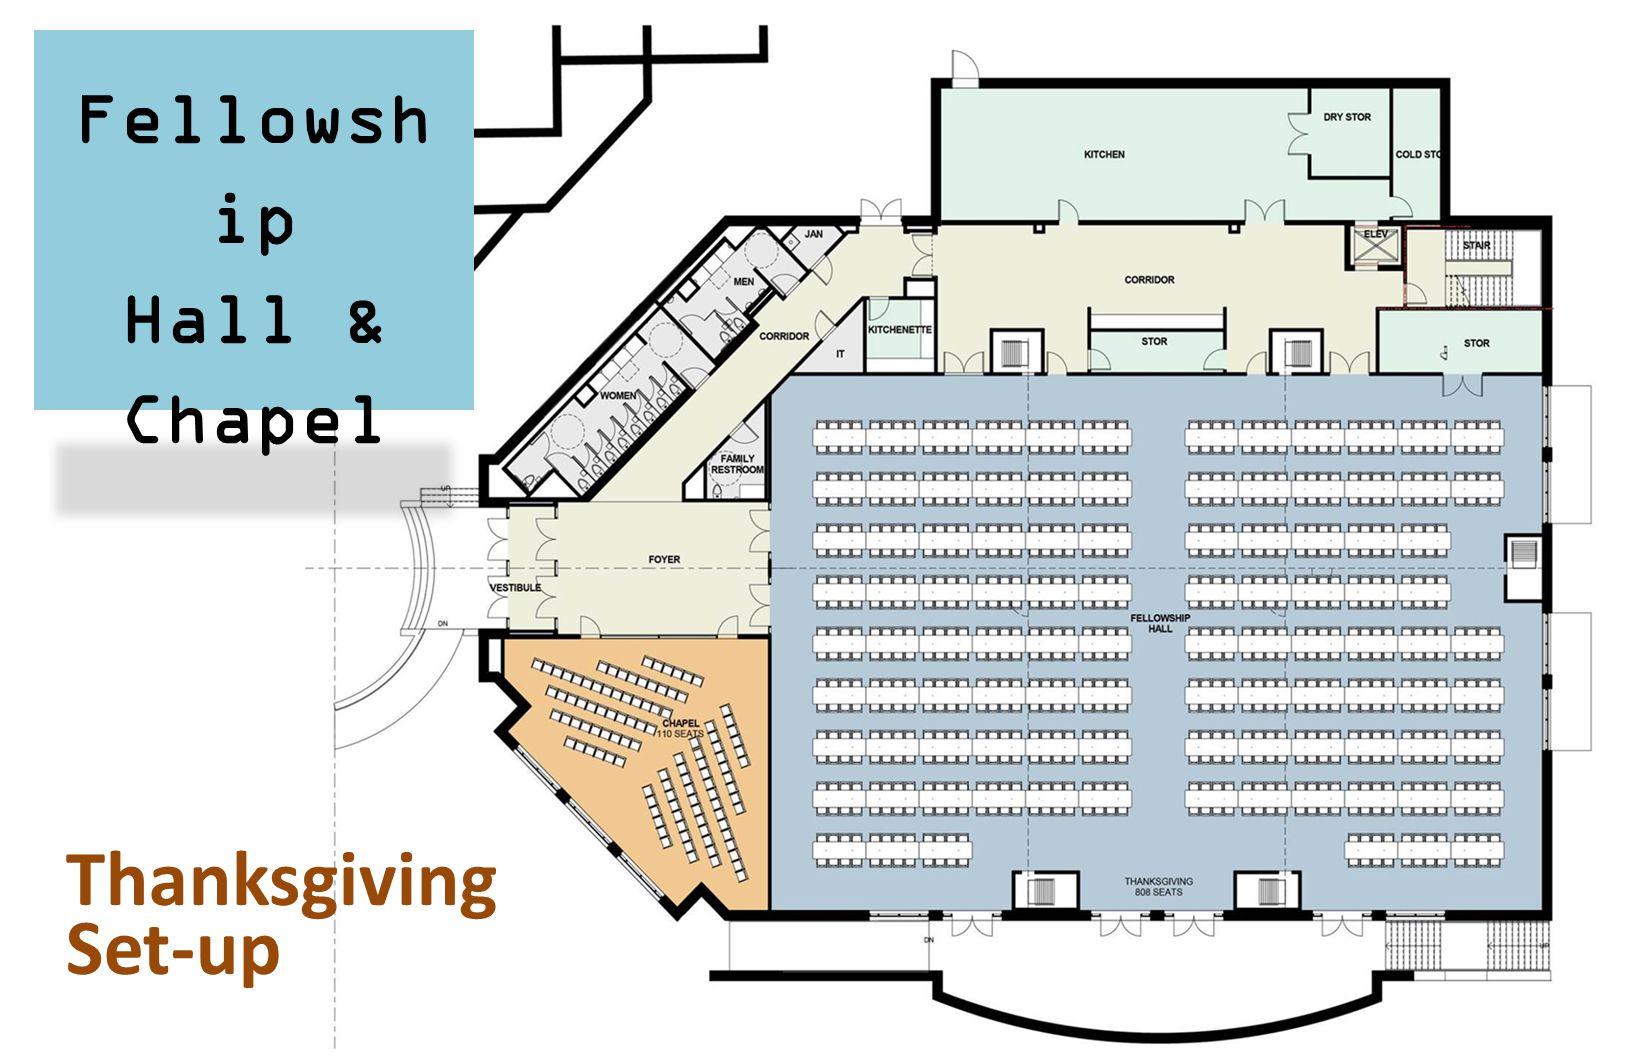 Fellowsh ip Hall & Chapel Thanksgiving Set-up